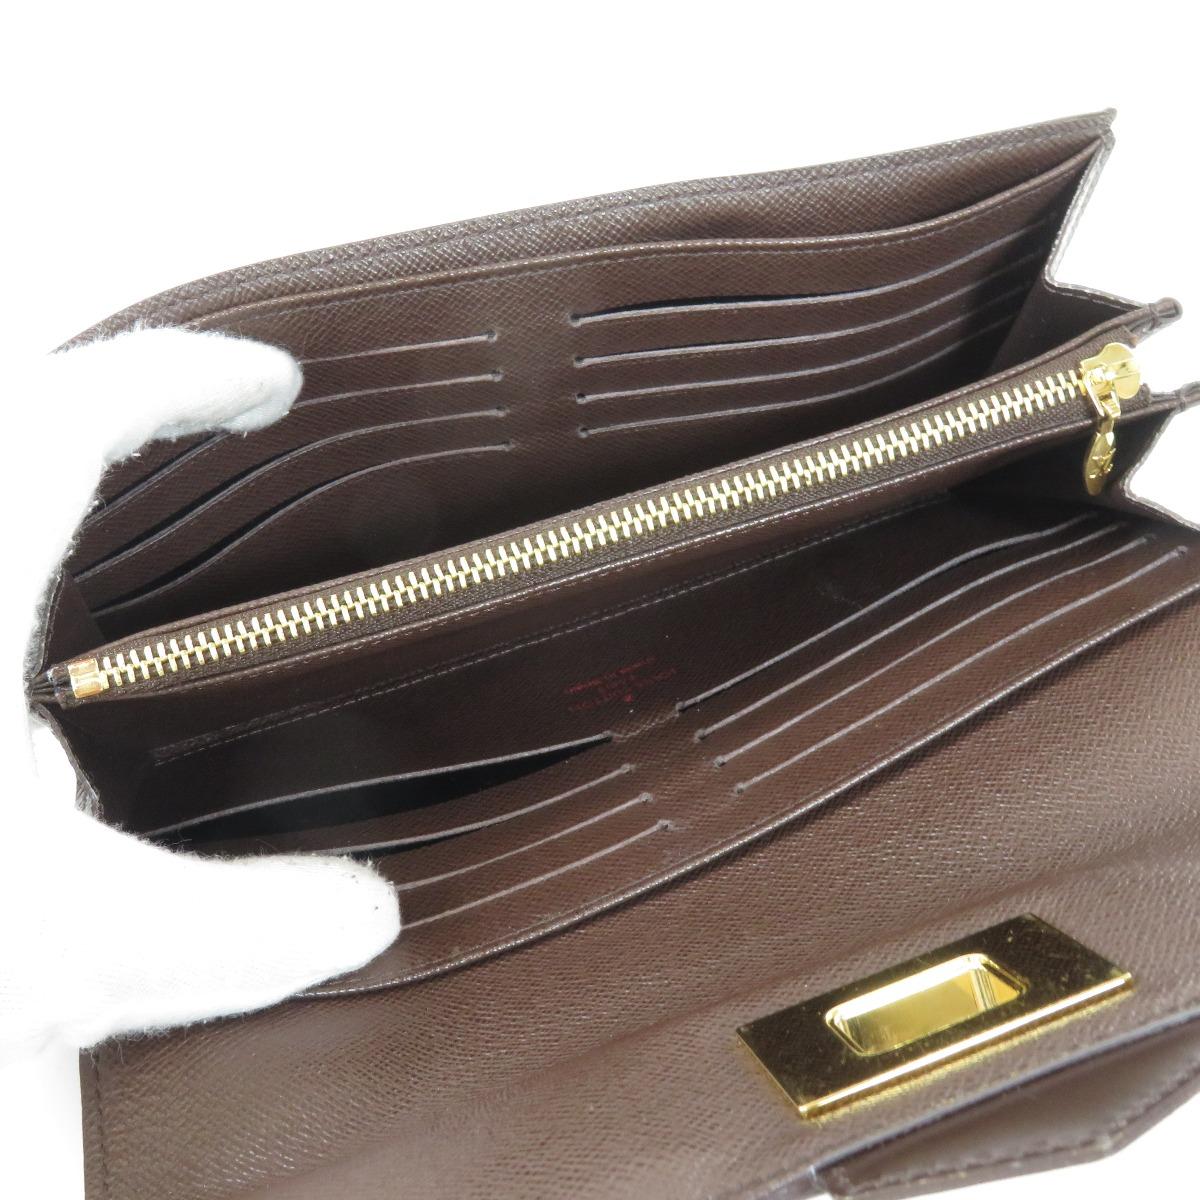 8caaeaa89e0f LOUIS VUITTON N63017 ポルトフォイユ・ローズベリー 長財布(小銭入れ ...